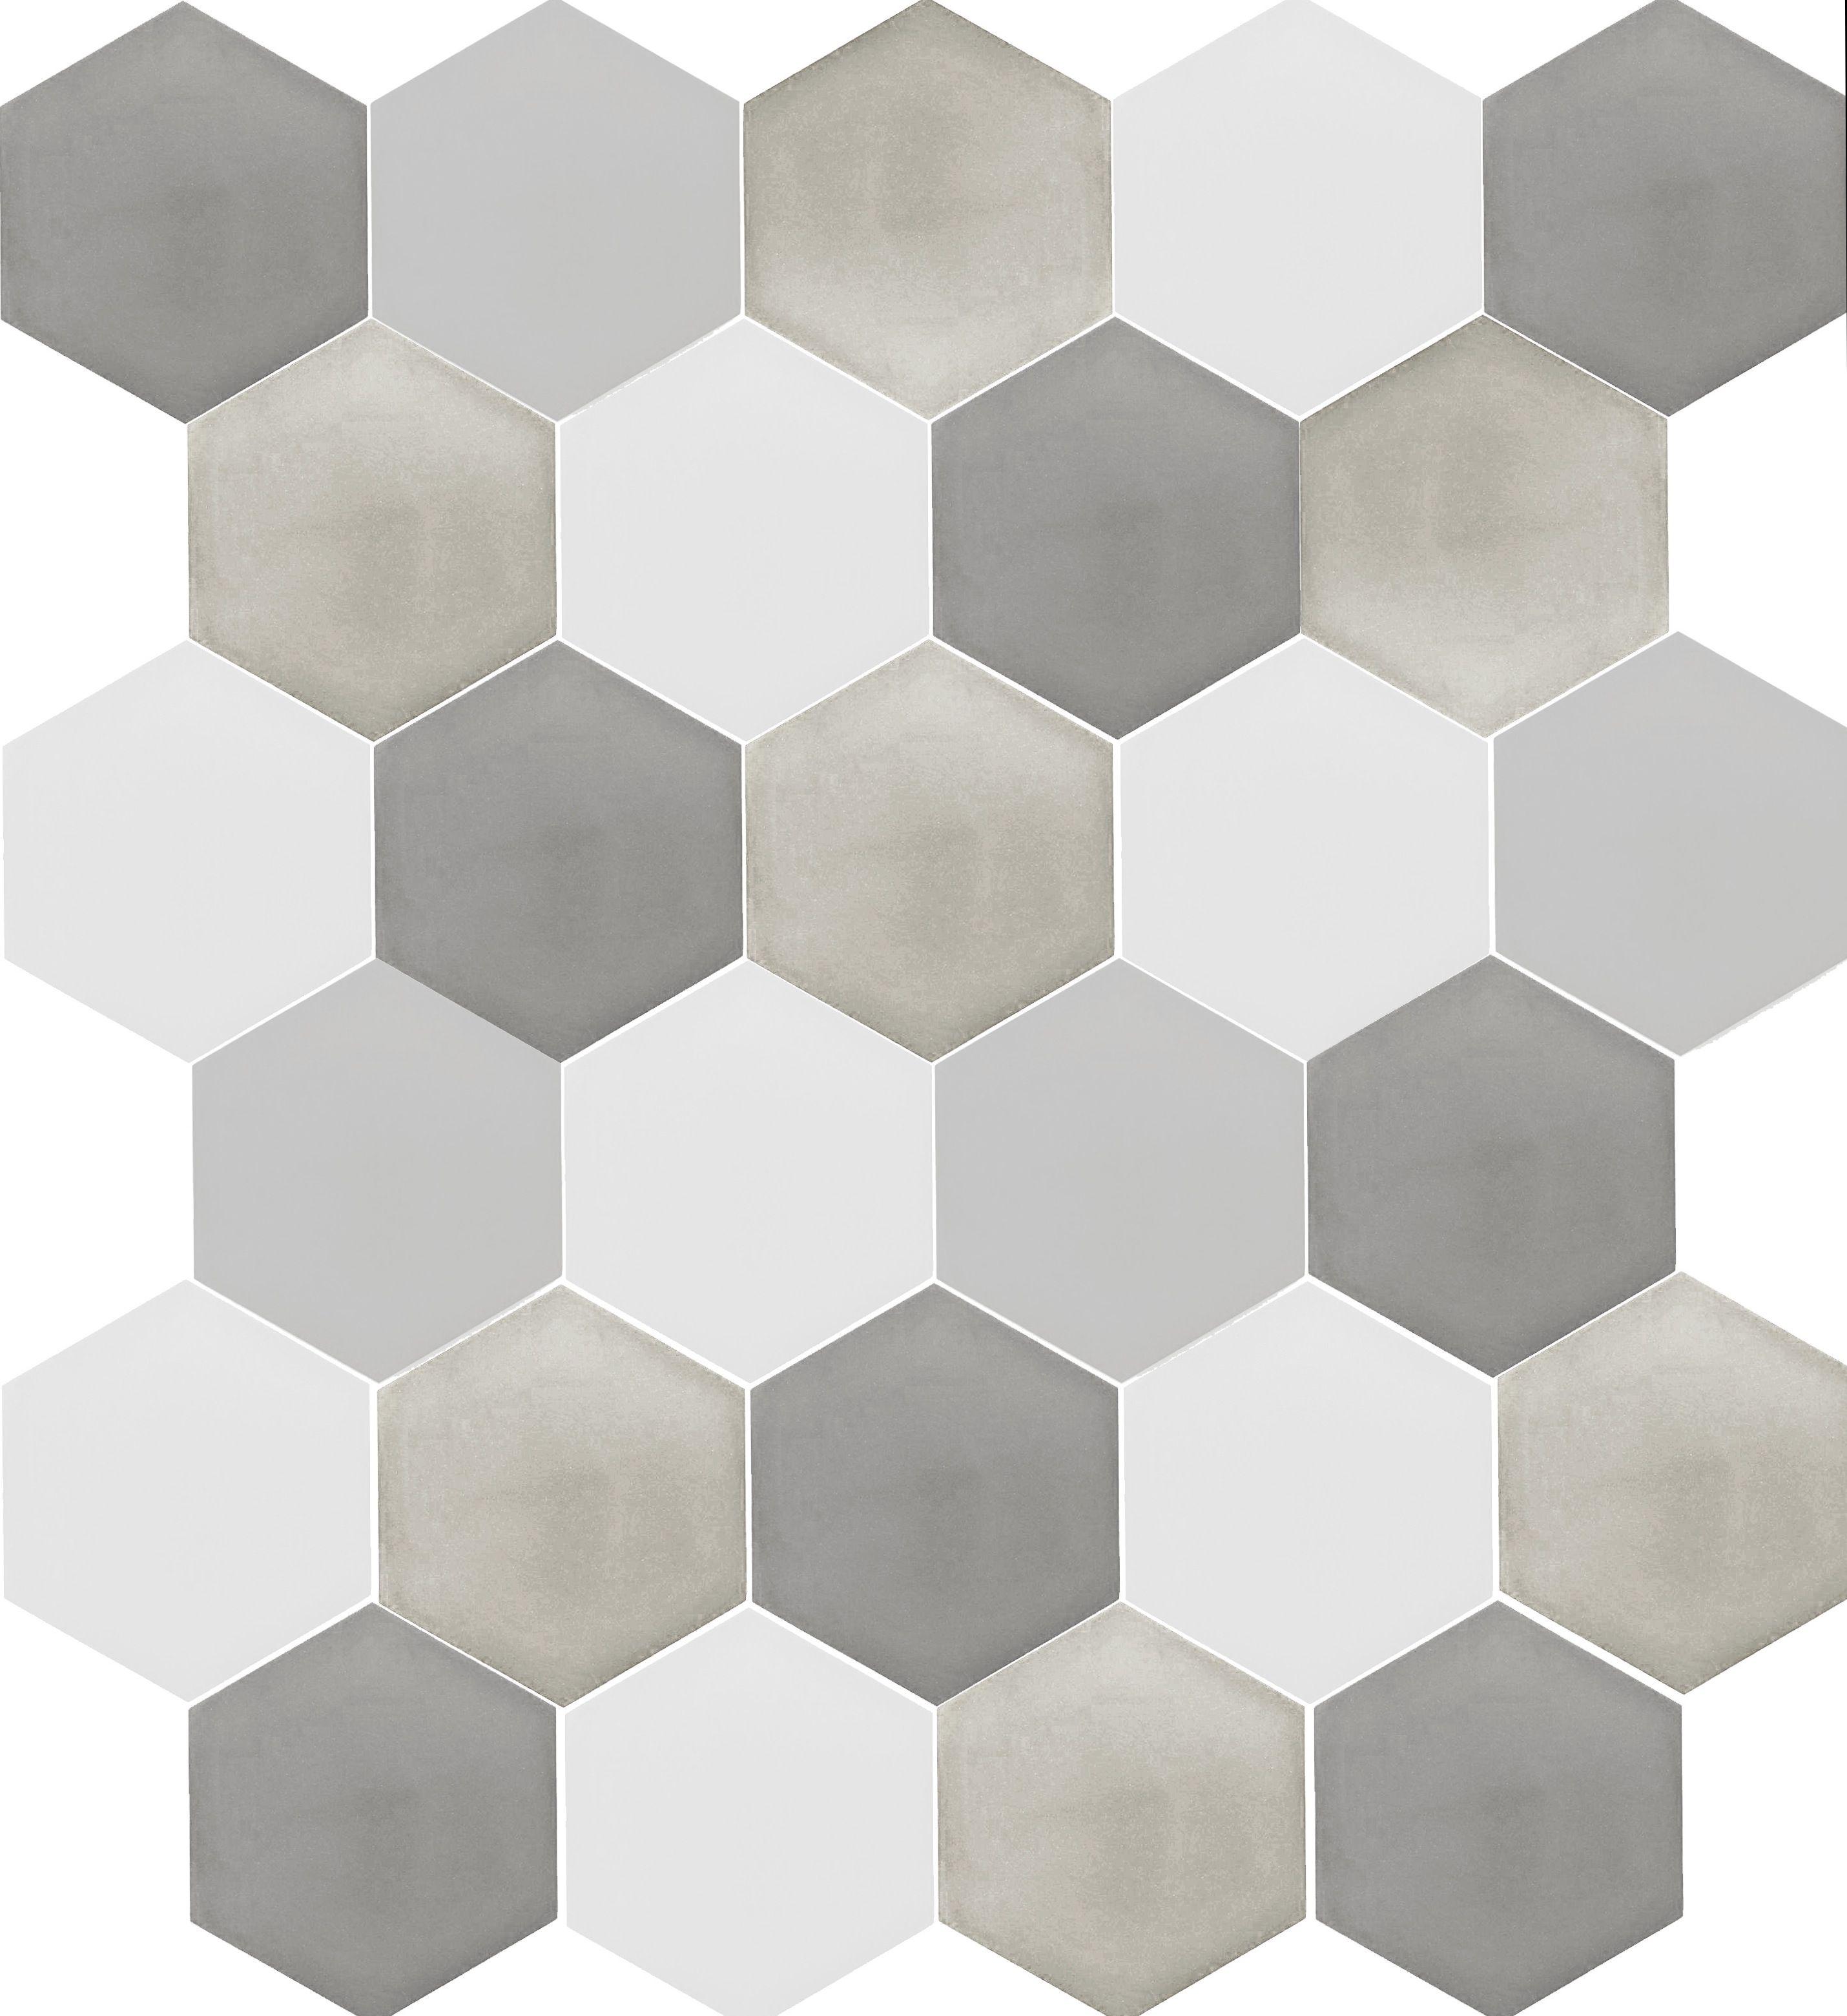 Paviment Rajola Hexagonal De Ciment En Colors Texturas Para